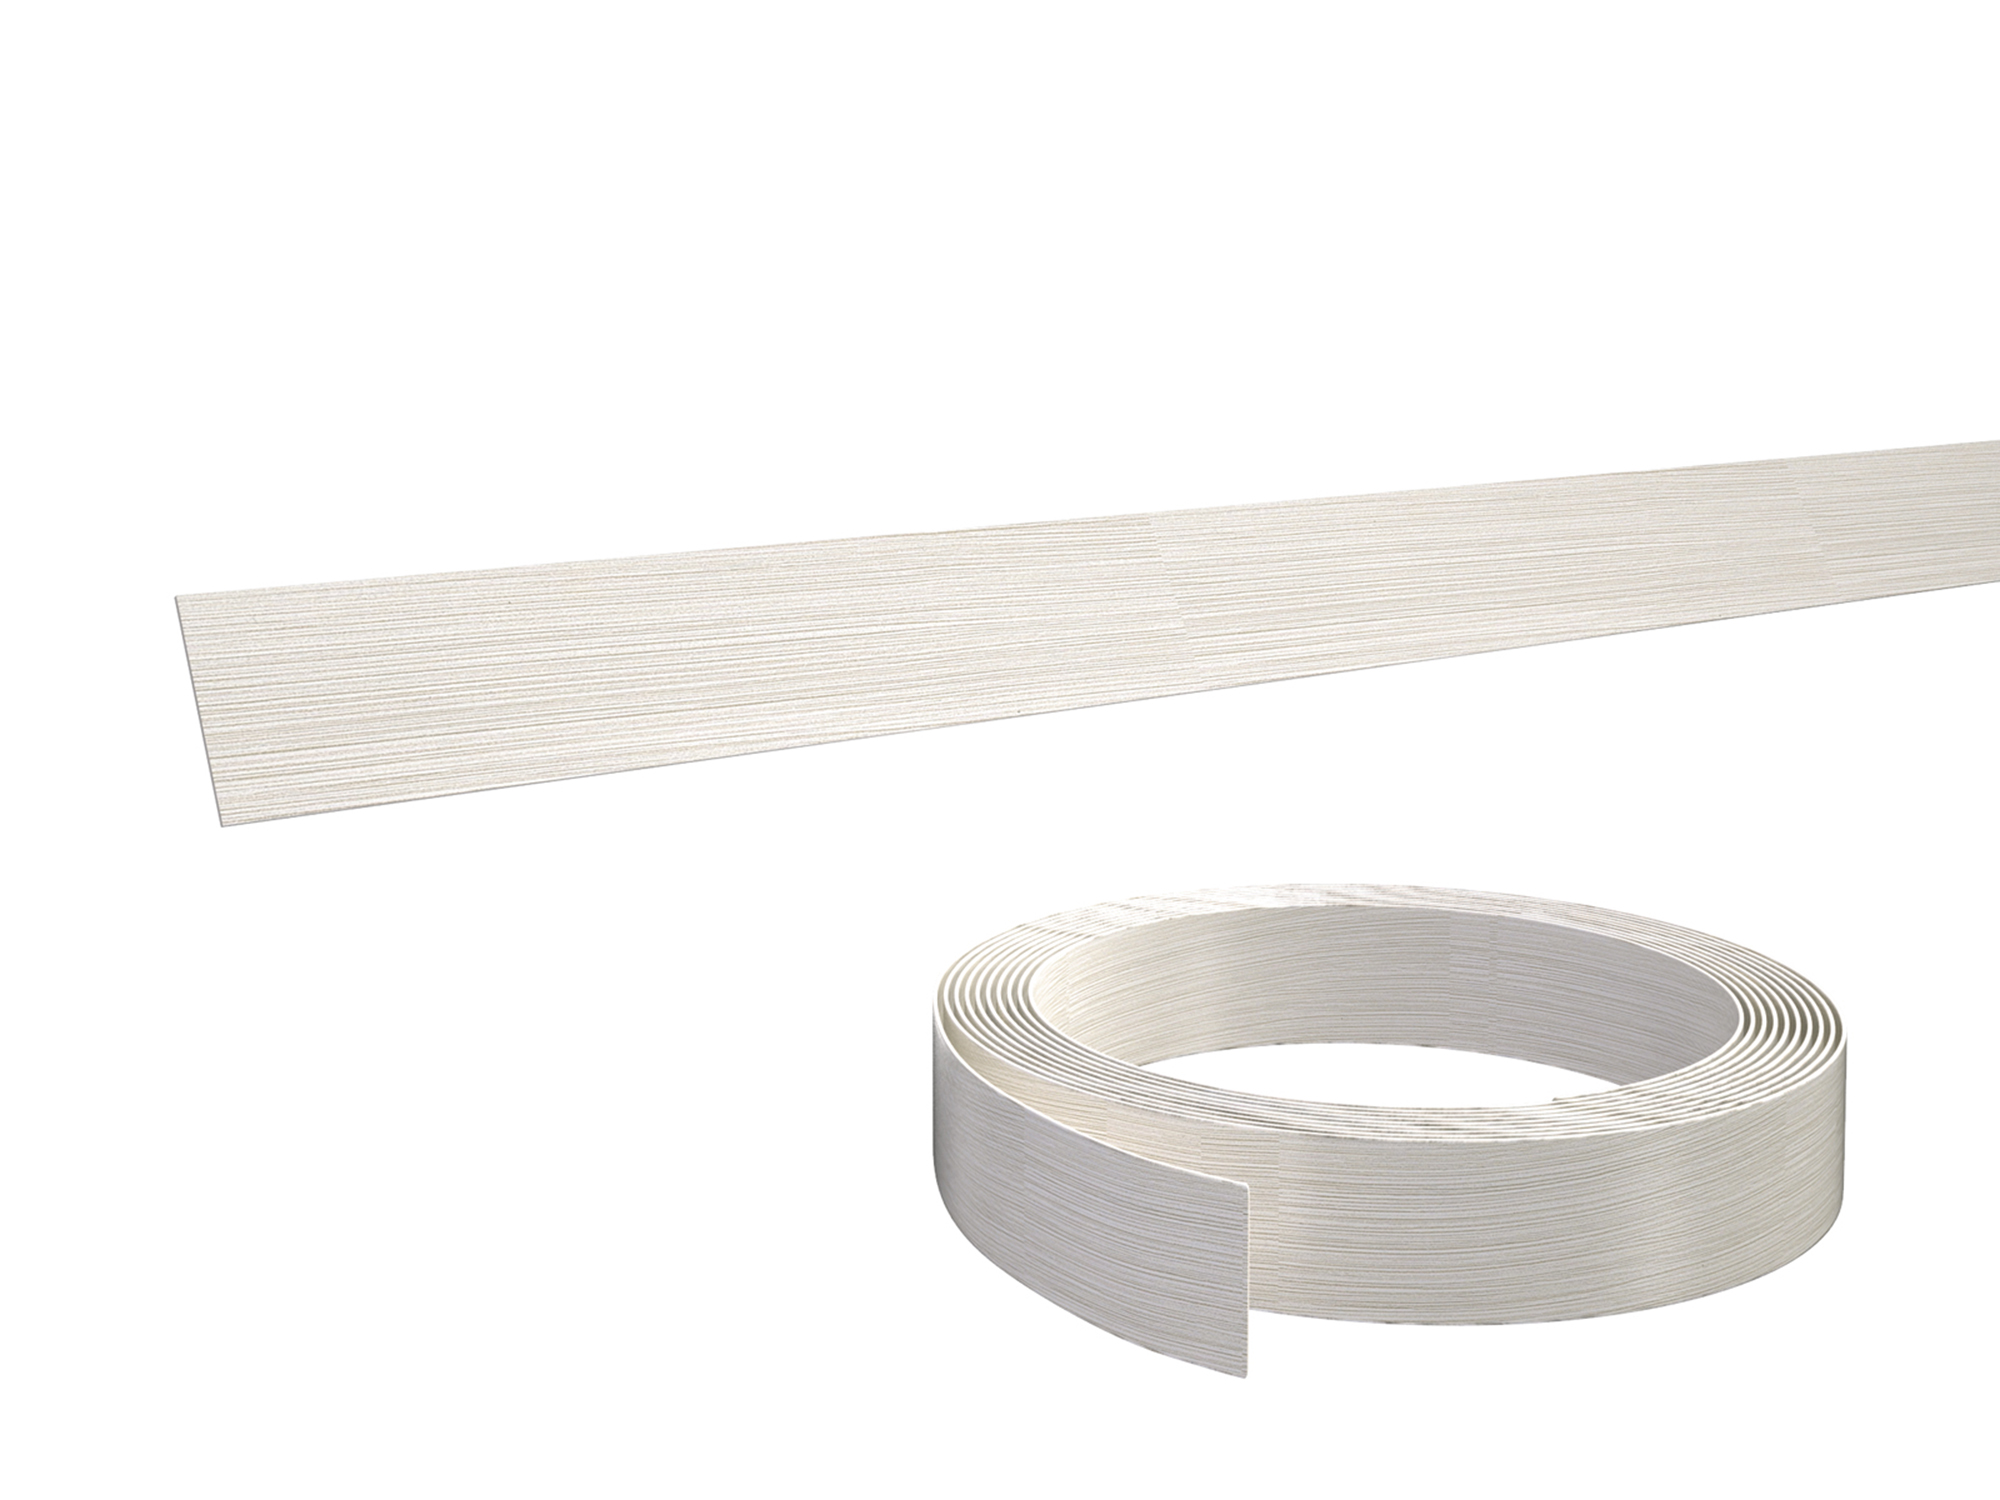 Кромка для плинтуса Риголетто светлый, код цвета 142М, Пластик